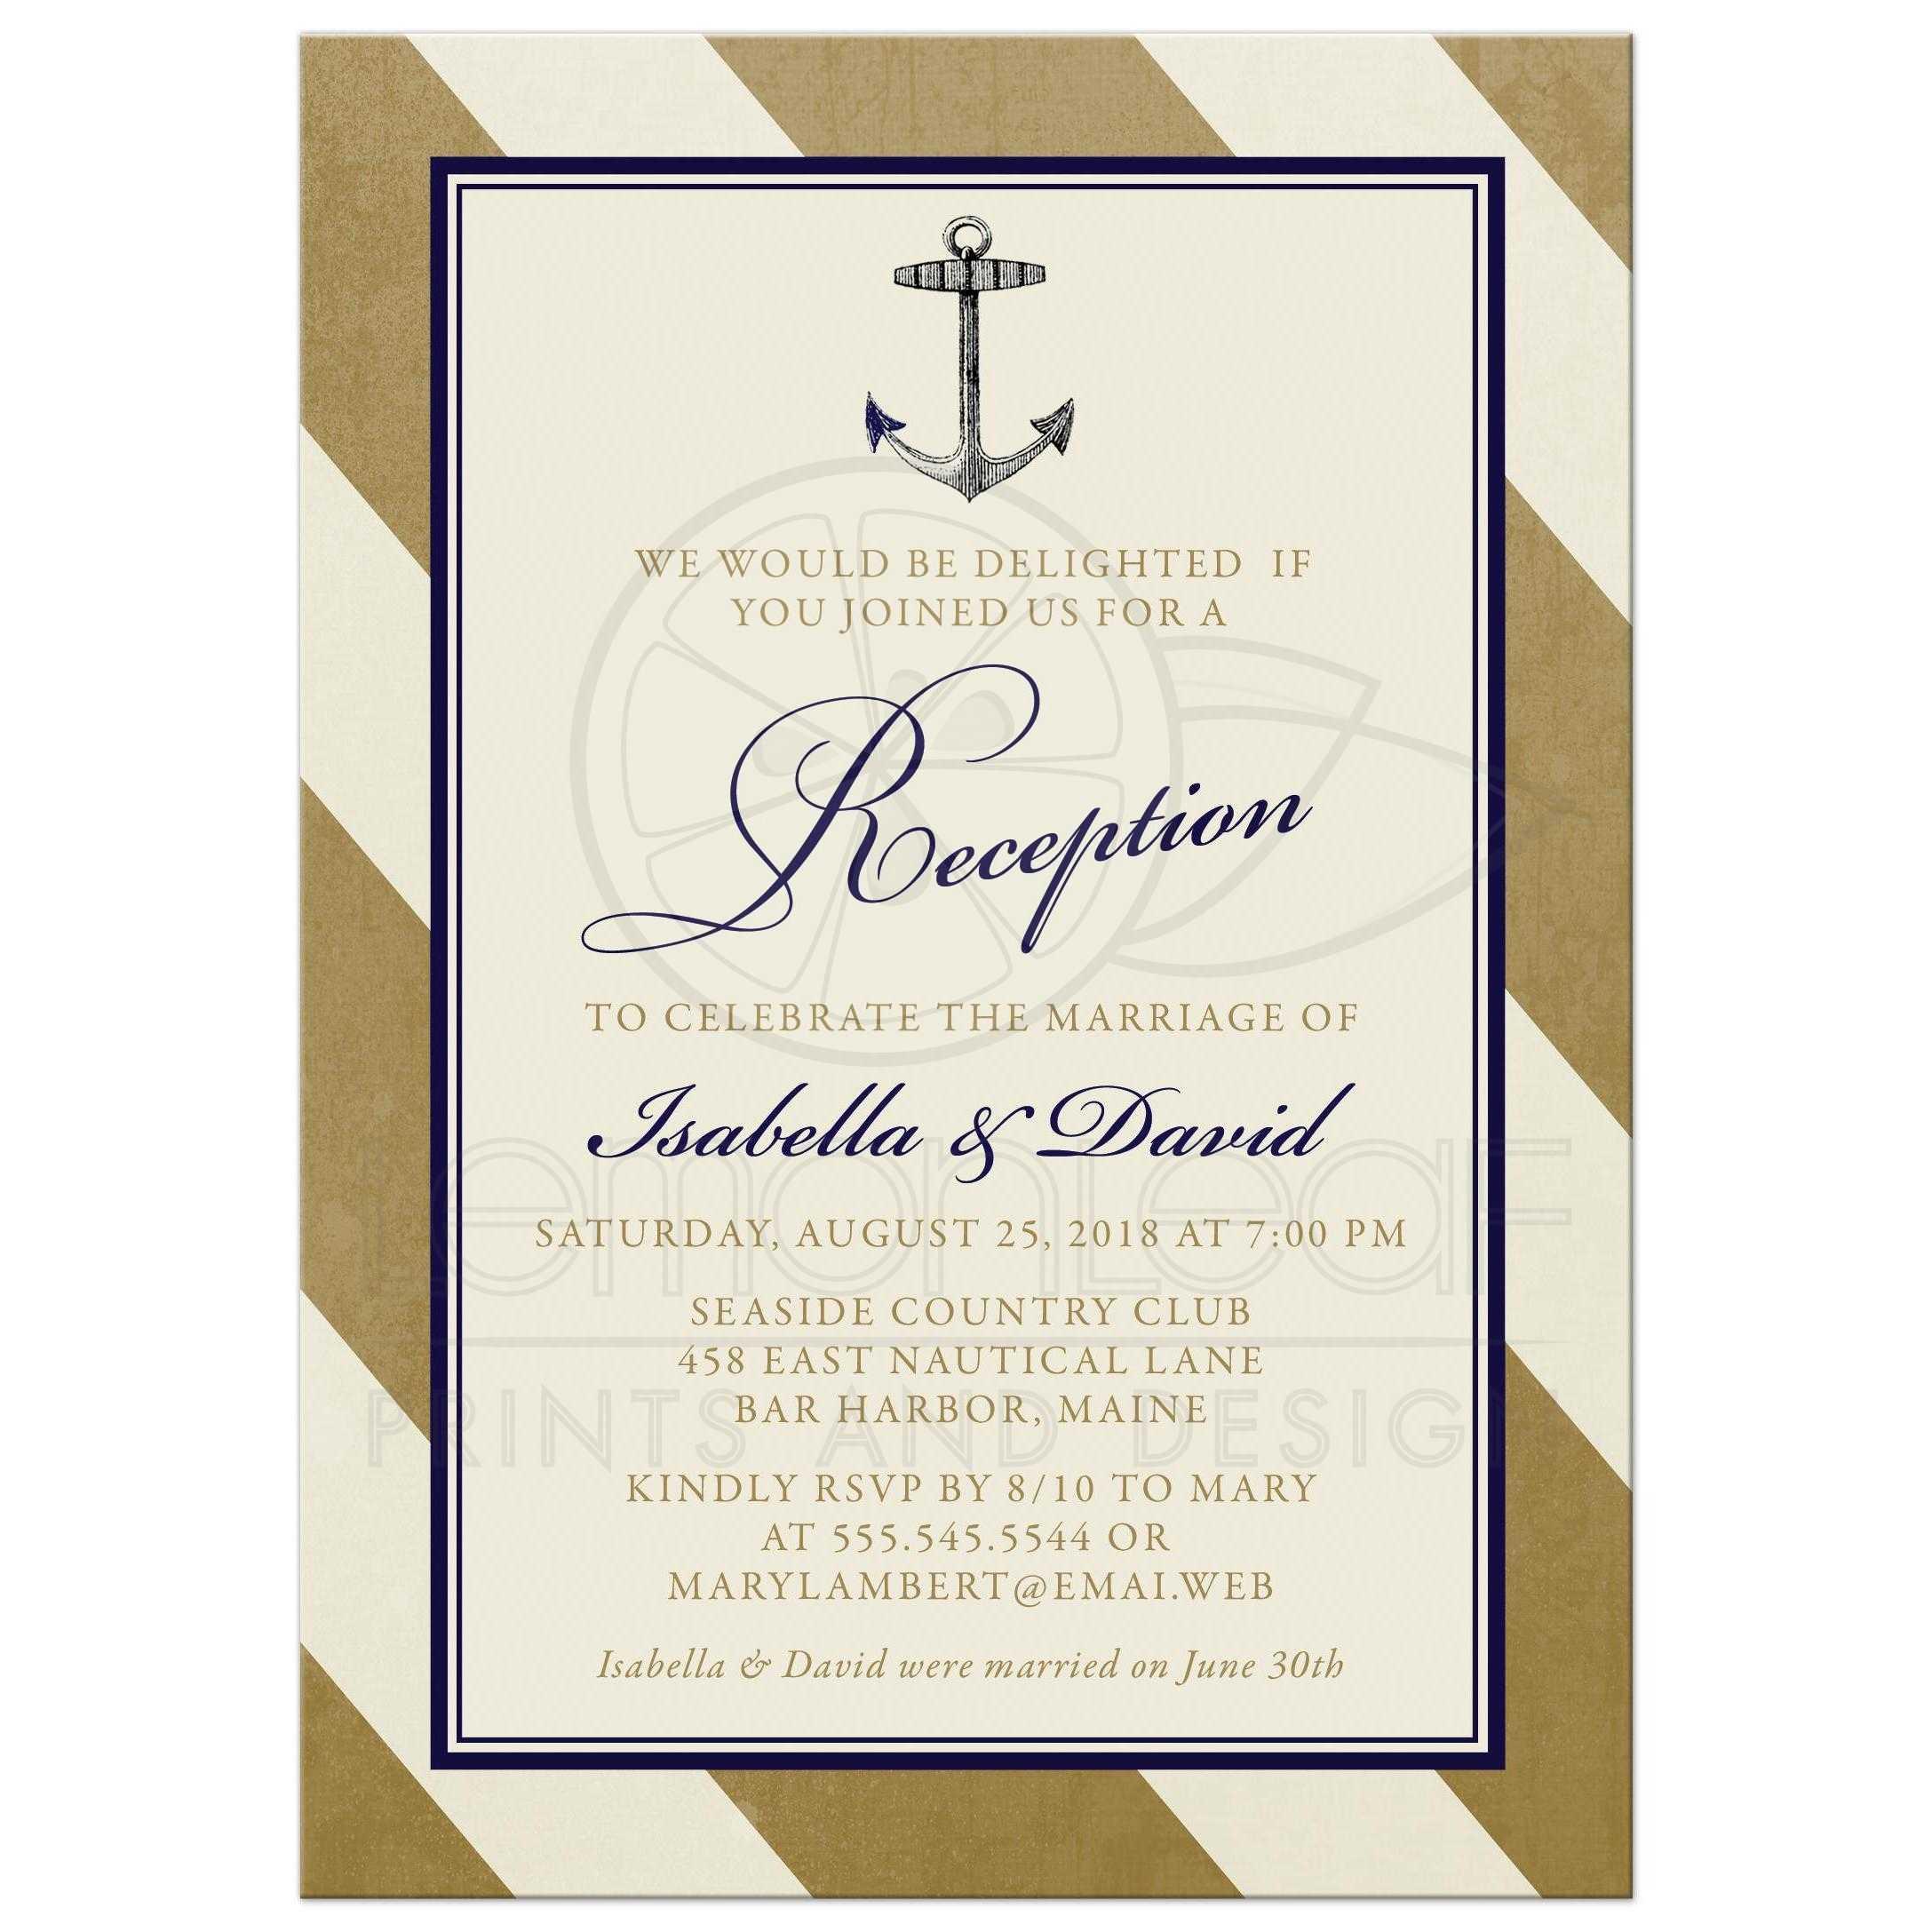 wedding reception invitations only reception only wedding invitations Reception Only Wedding Invitation Wording Rugalah Com